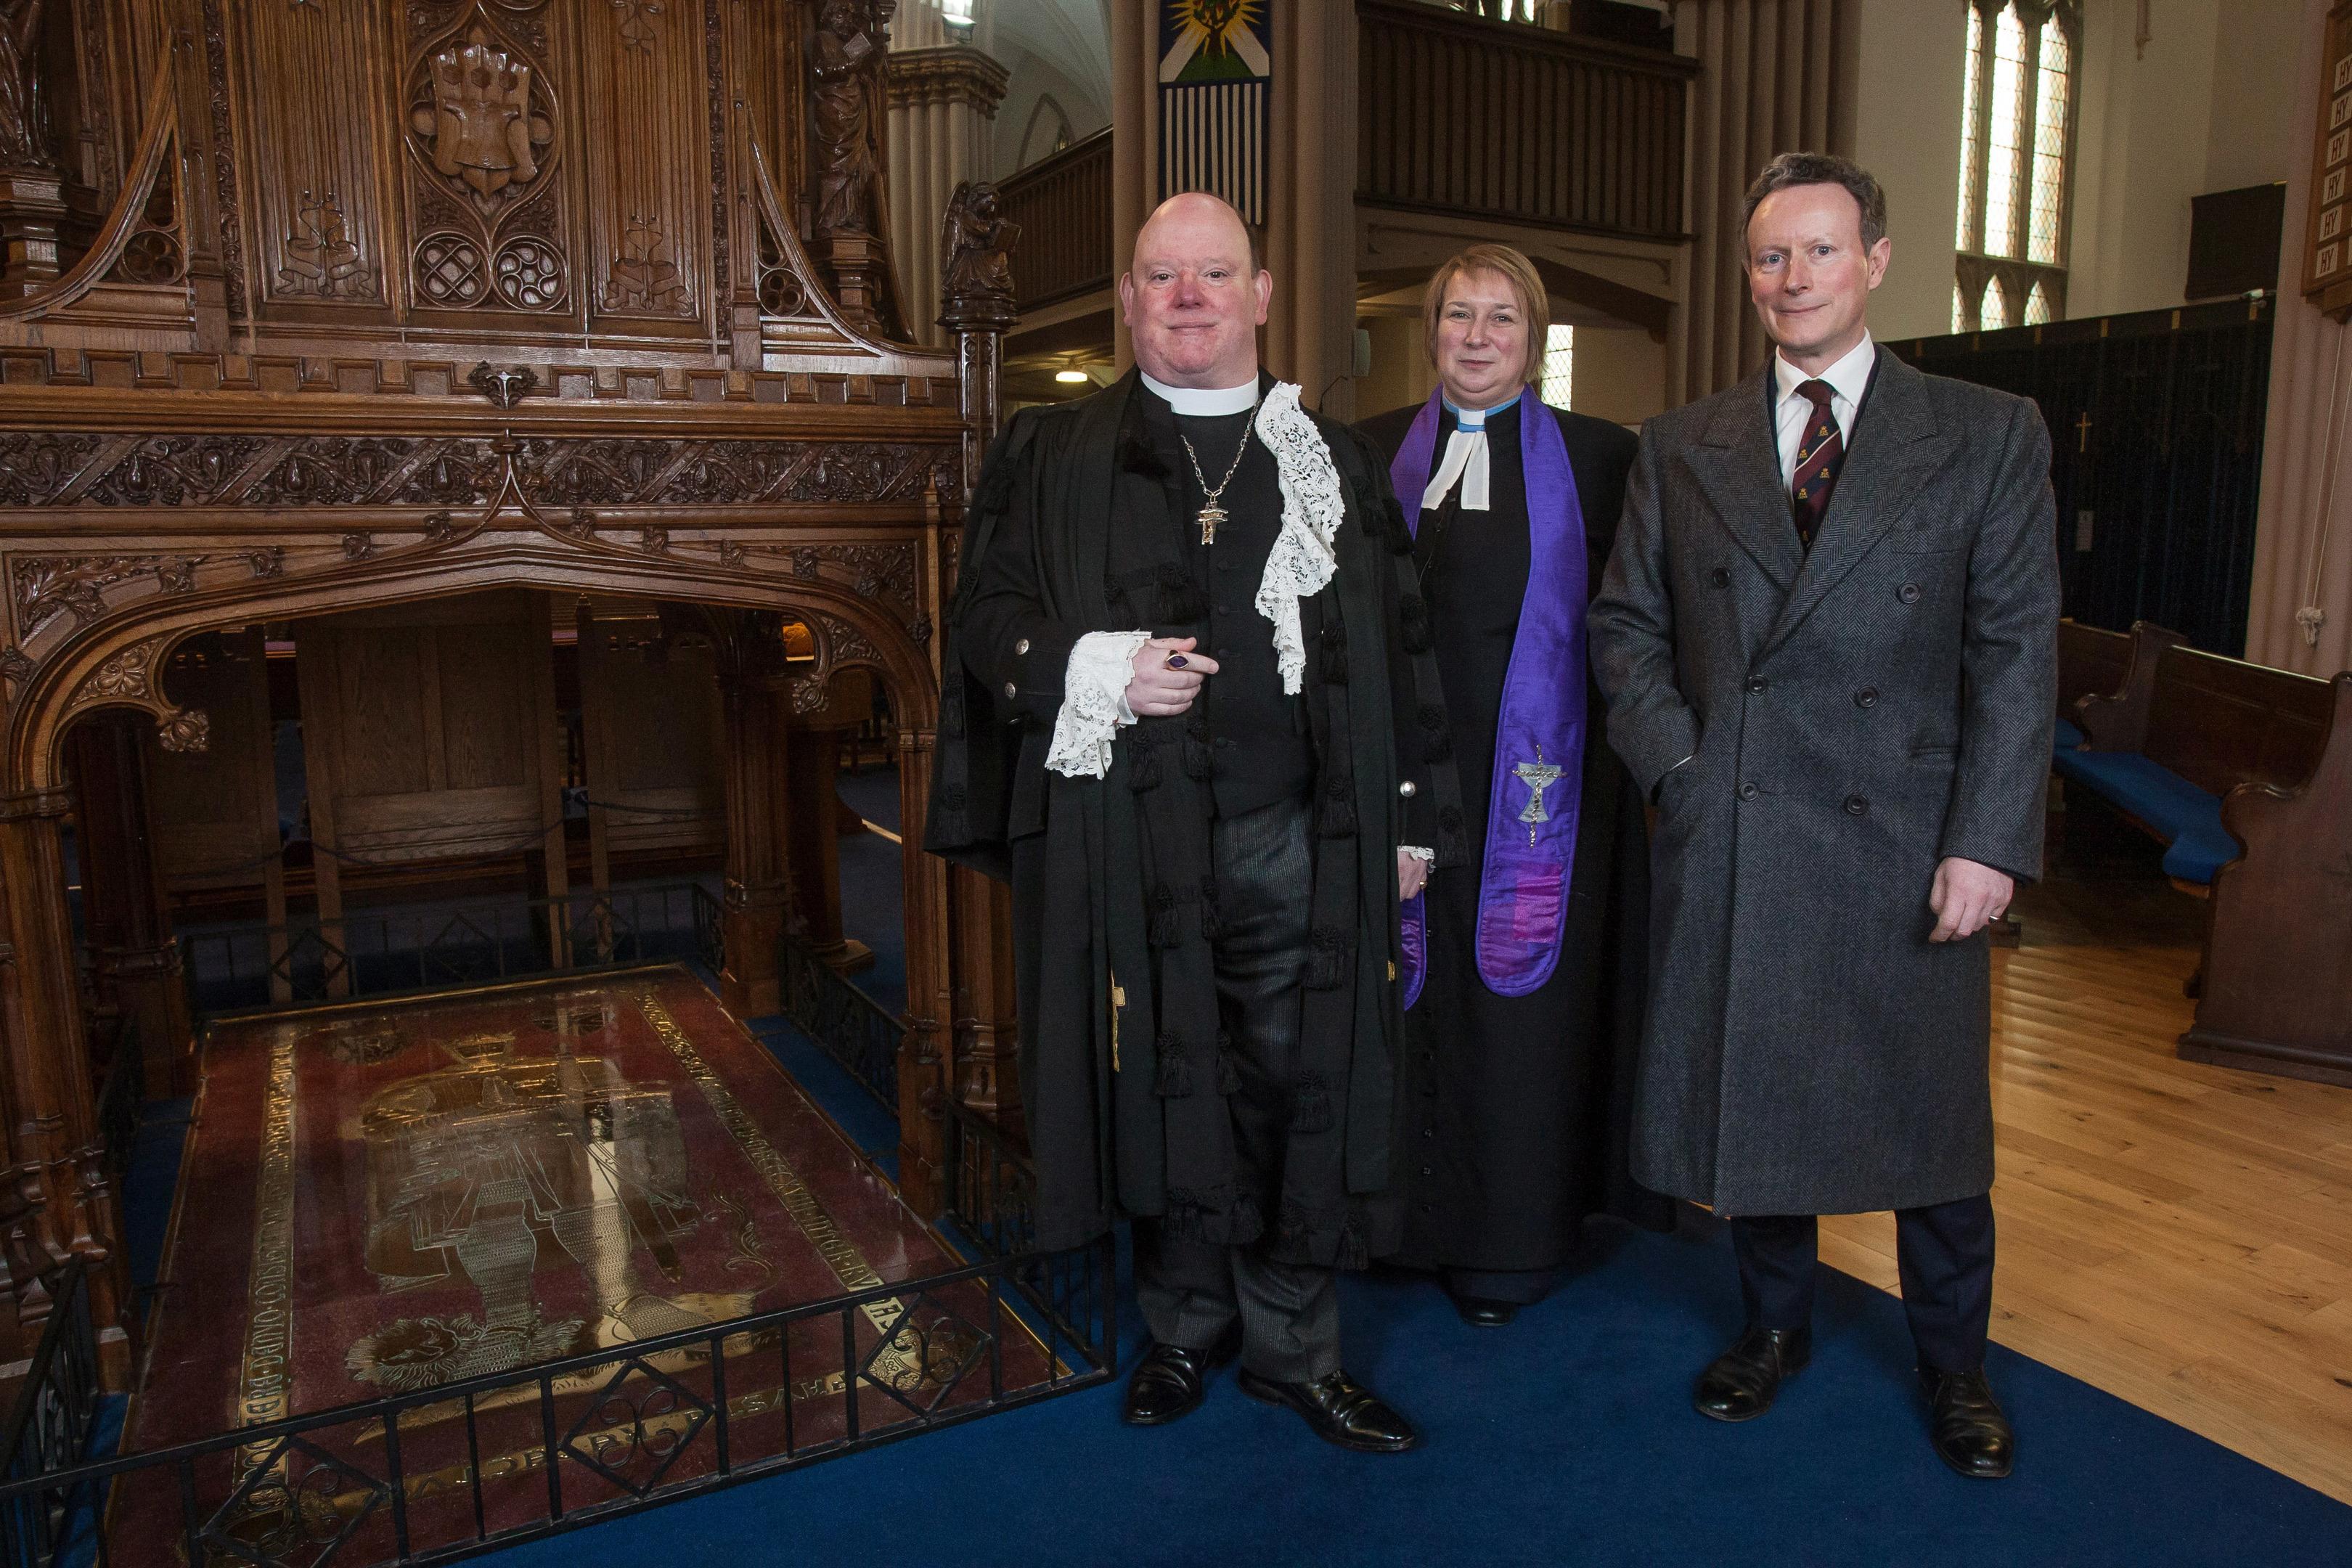 Rt Rev Dr Derek Browning, Abbey Minister Rev MaryAnn Rennie, and  Lord Charles Bruce